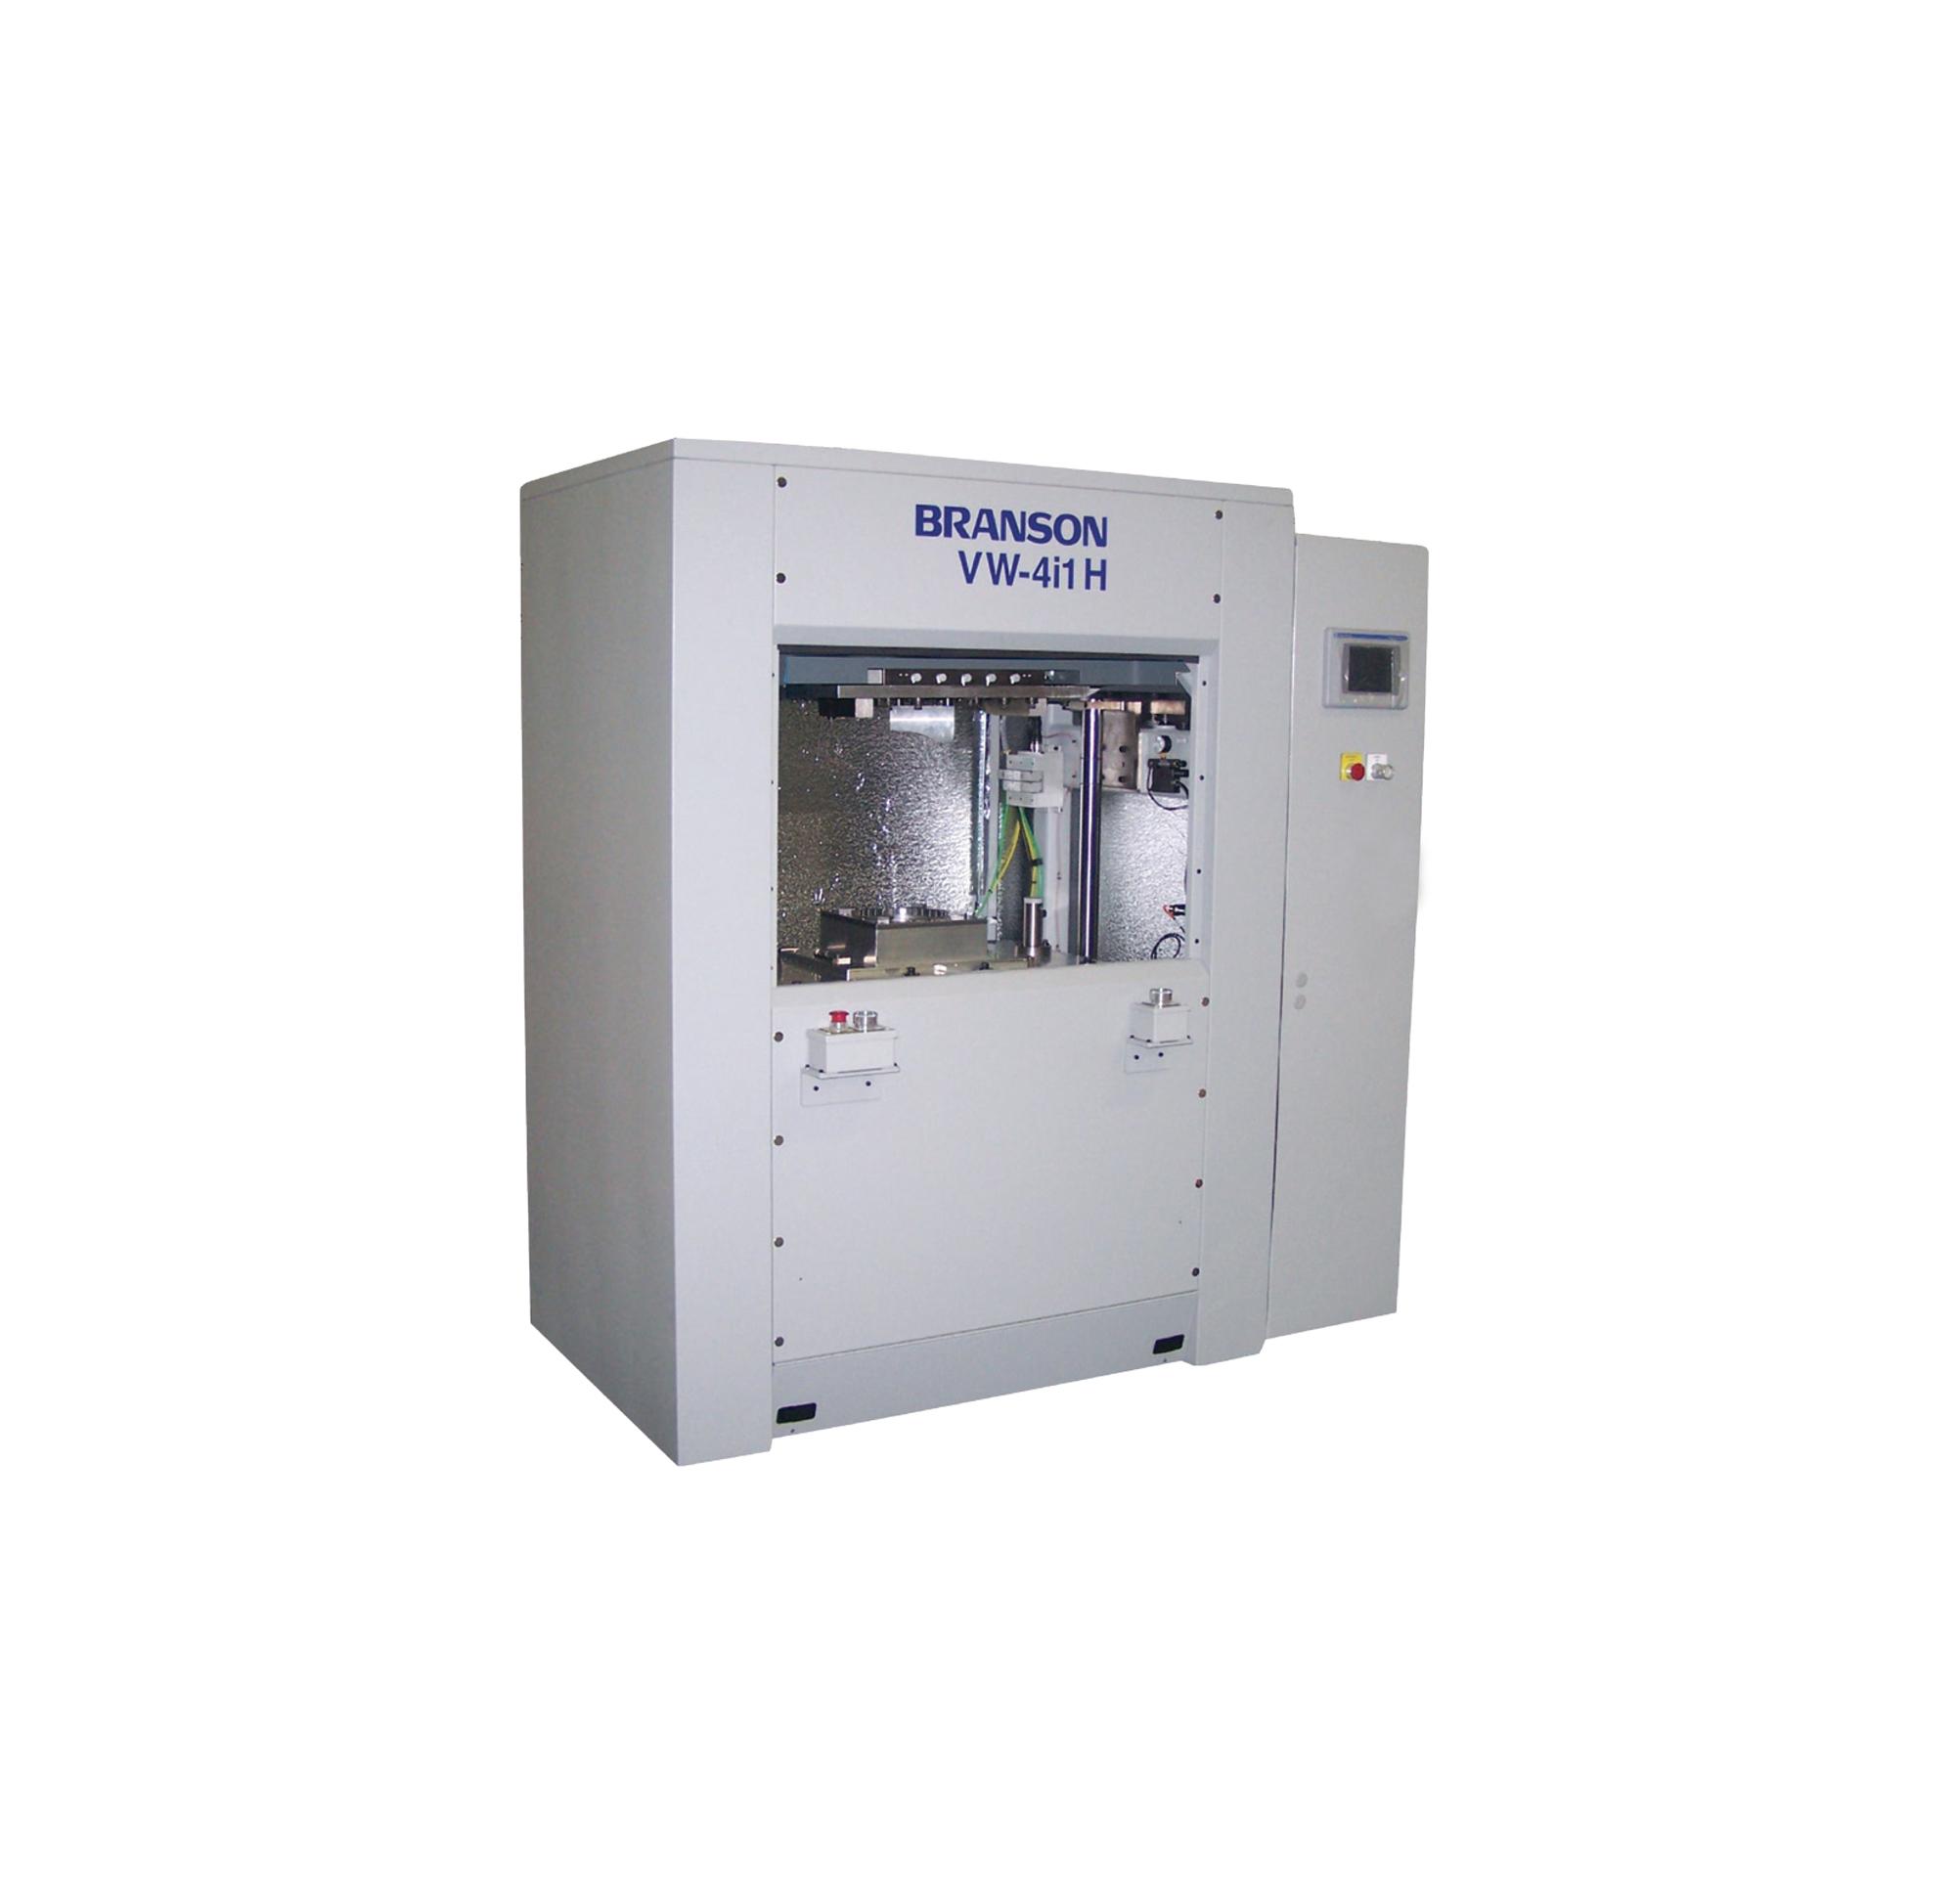 Plastic Vibration Welding | Emerson CA